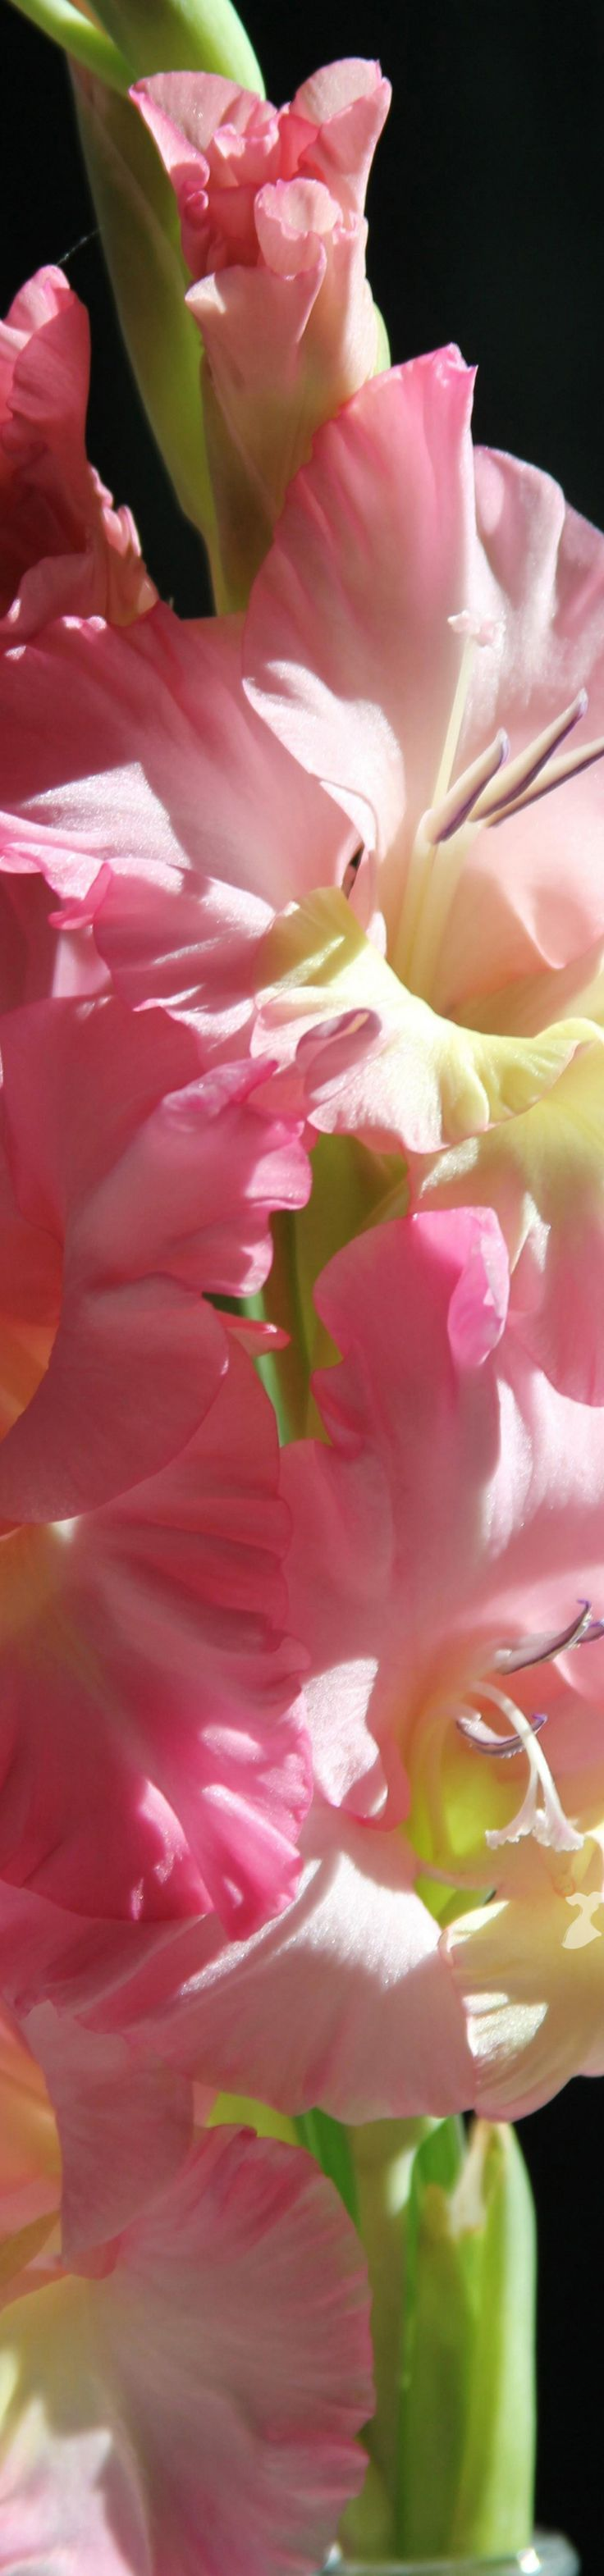 102 best flower favourites images on Pinterest | Beautiful flowers ...